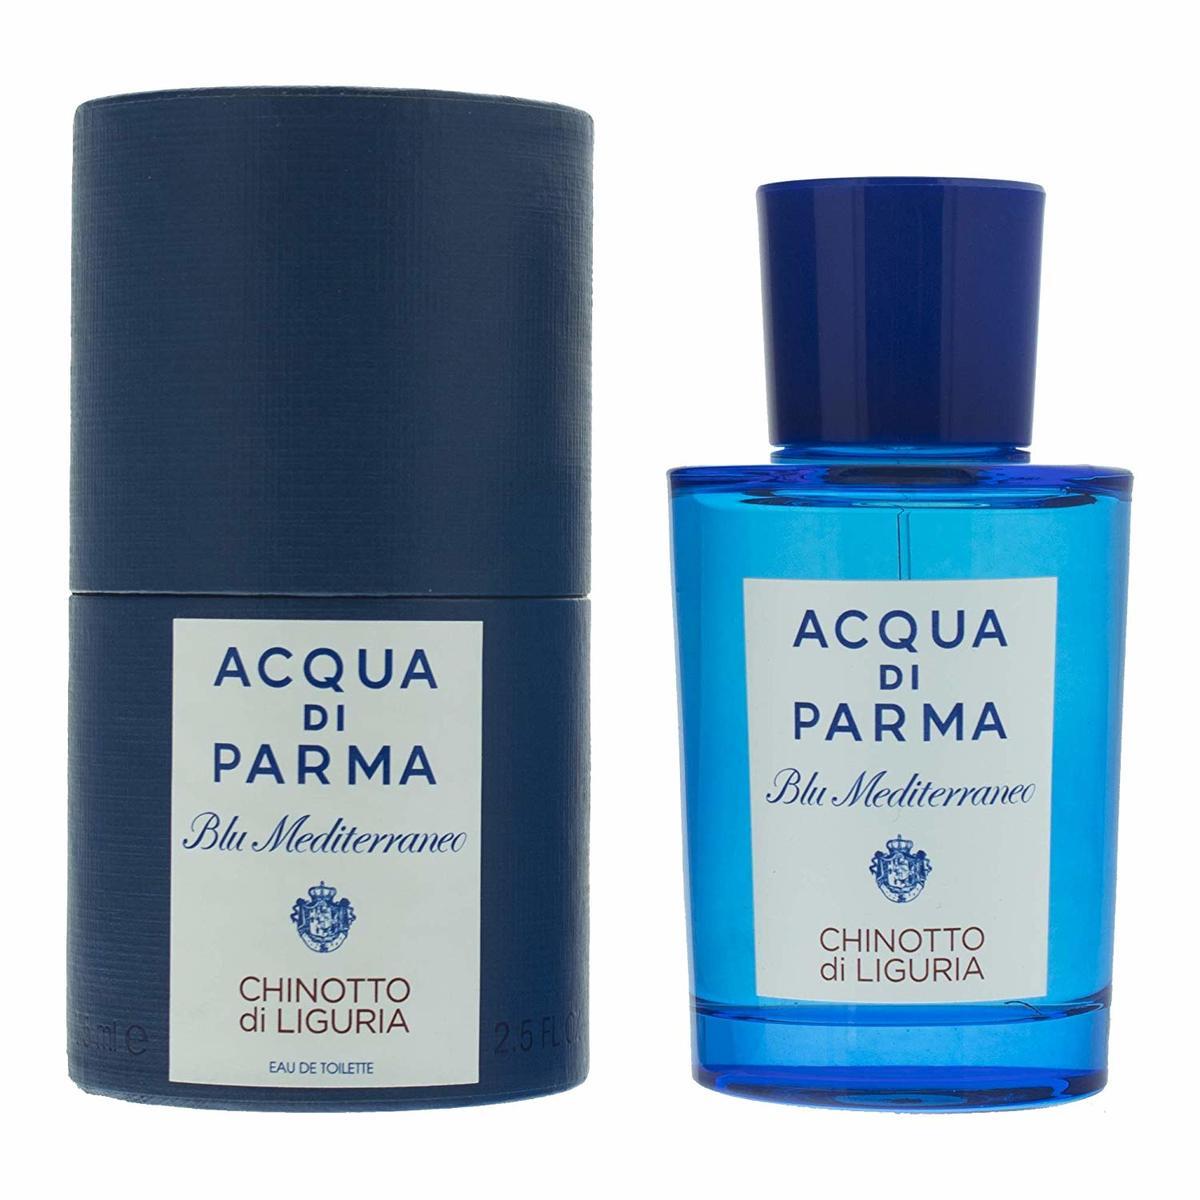 Acqua Di Parma アクアディパルマ ブルーメディテラネオ チノット ディ リグーリア オードトワレ スプレー Blu Mediterraneo Chinotto Di LiguriaEau De Toilette Spray (Unisex) 2.5 oz / 75 ml